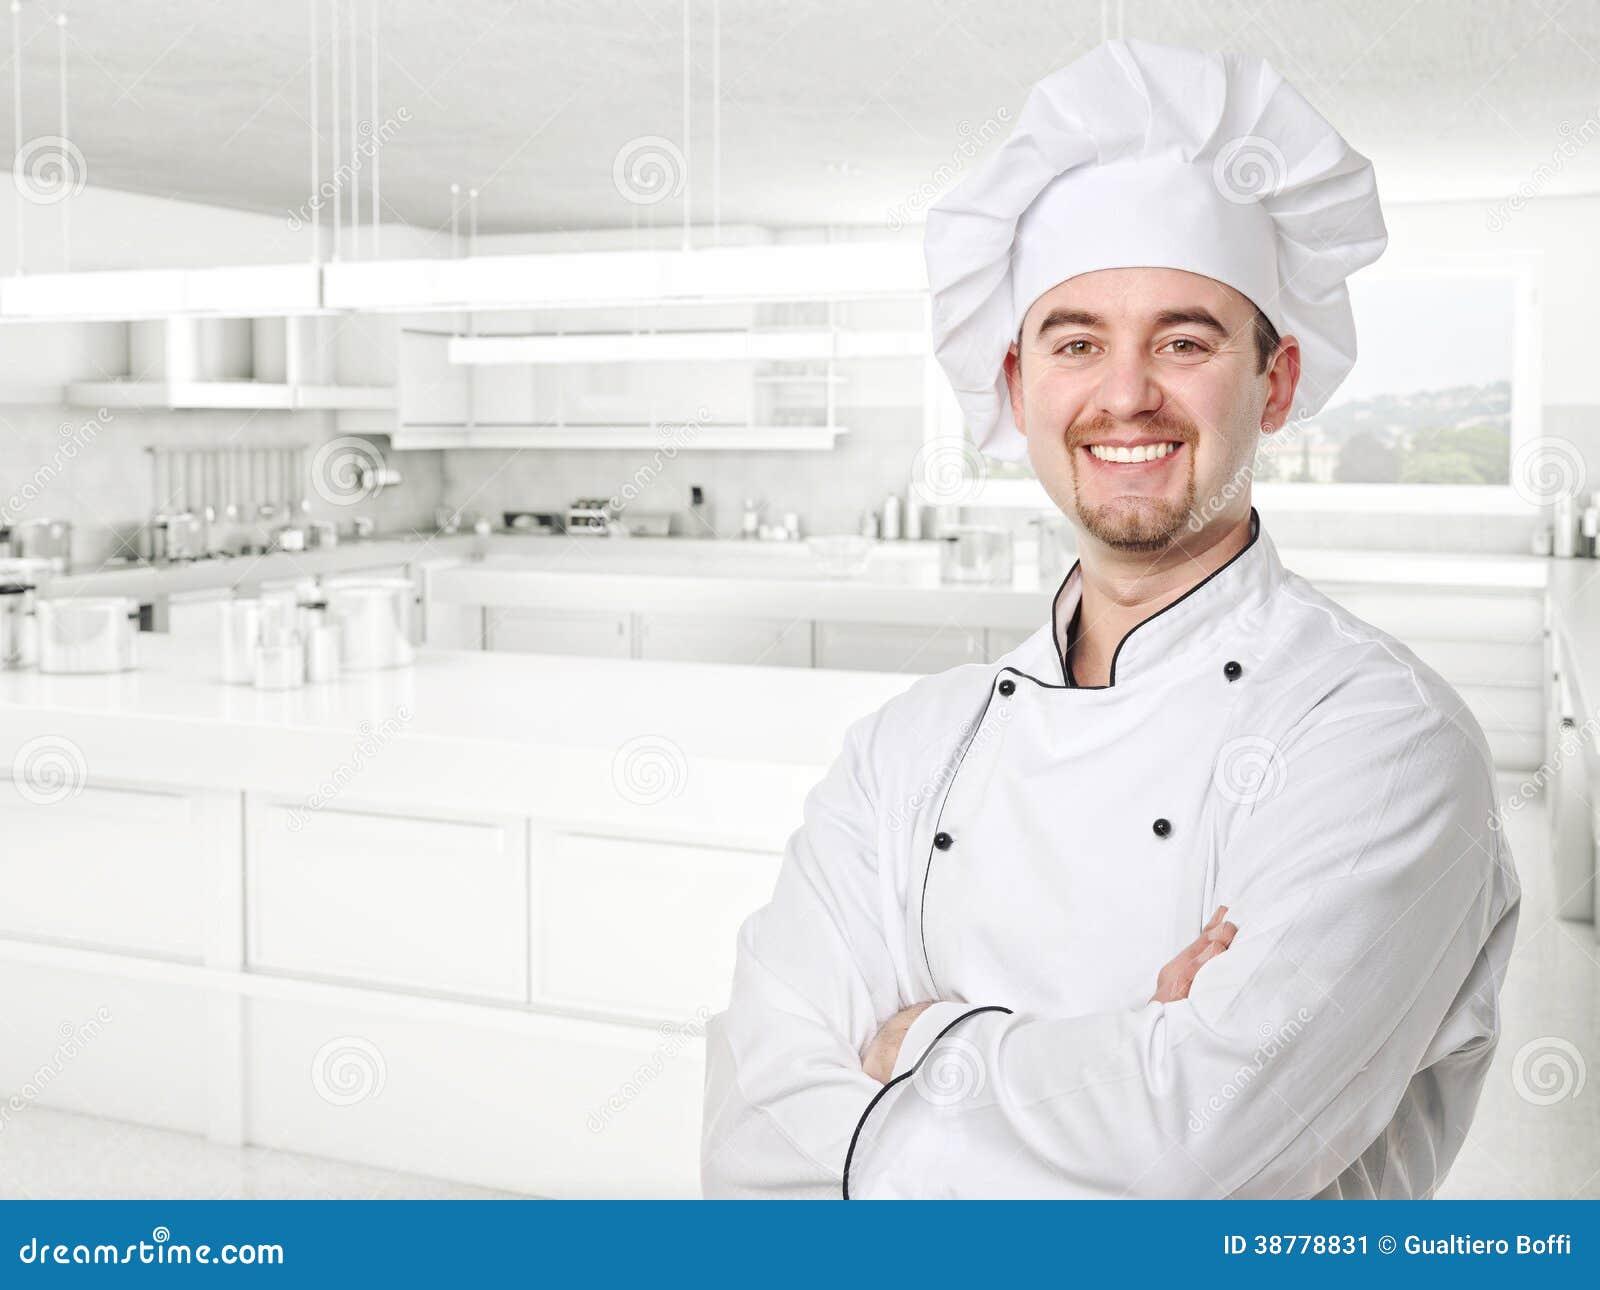 Chef portrait stock image. Image of confident, helper - 38778831